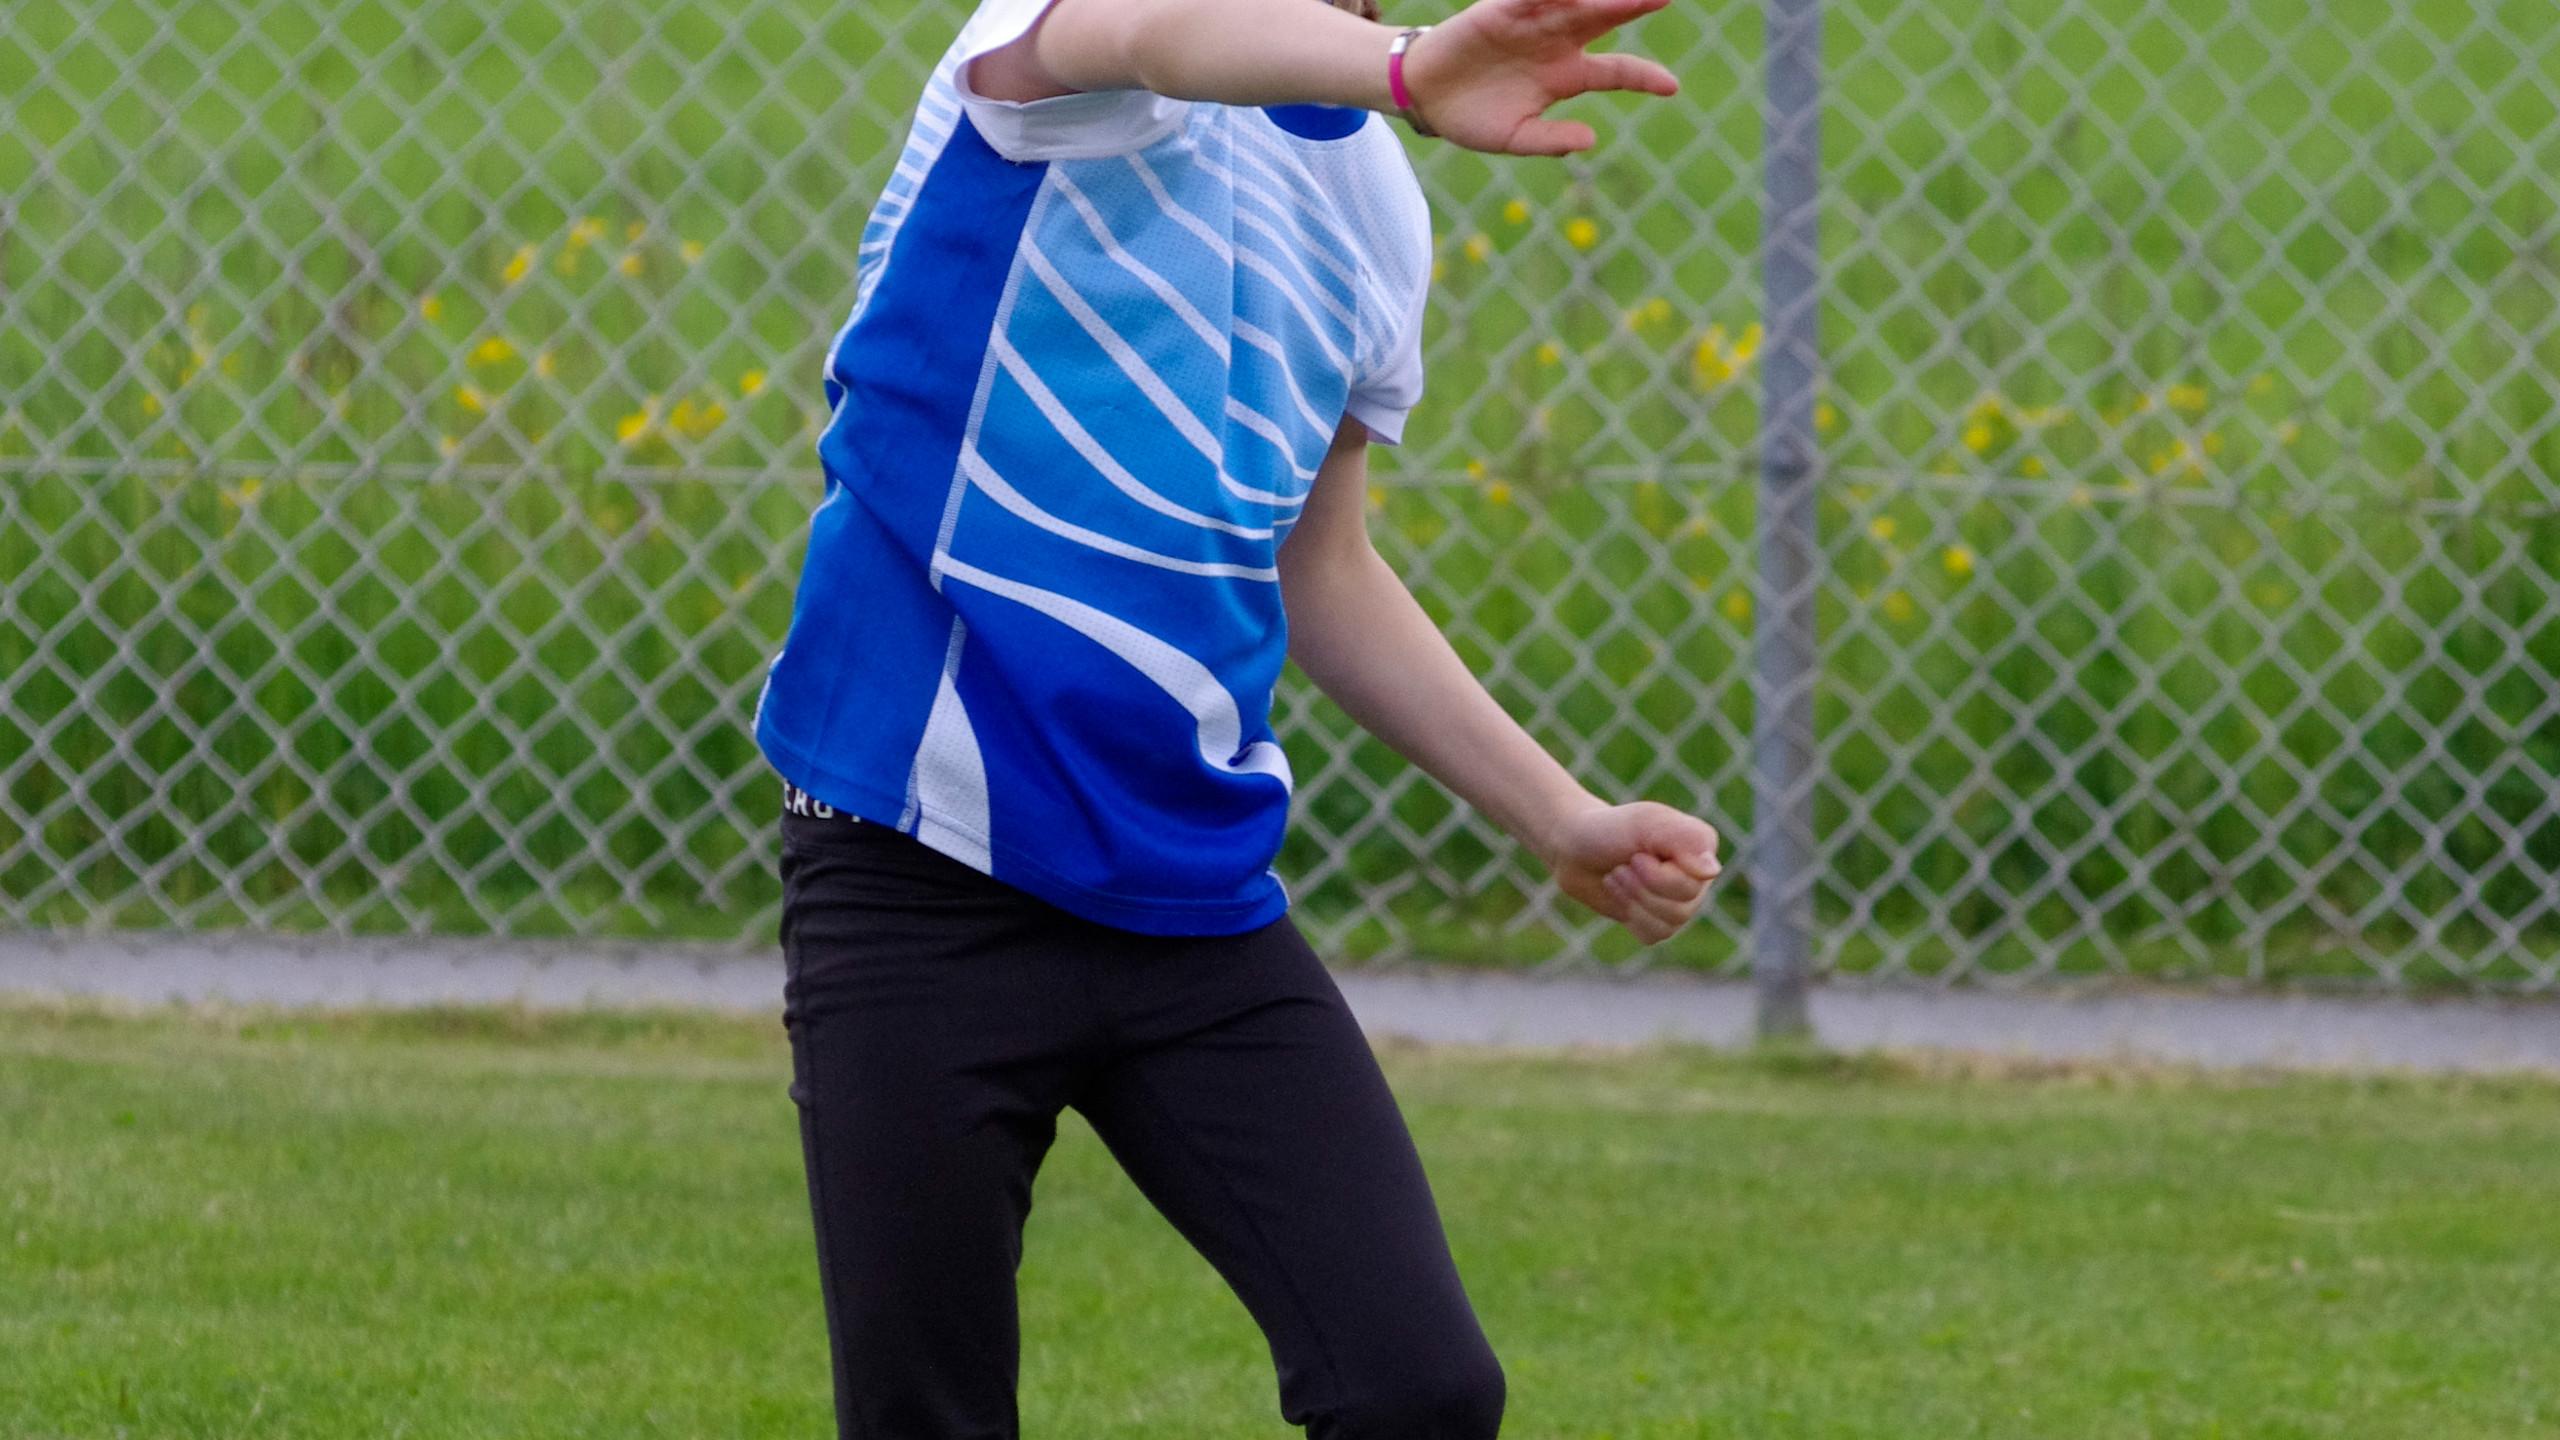 Wettkampf Fussach 11.05 (8)